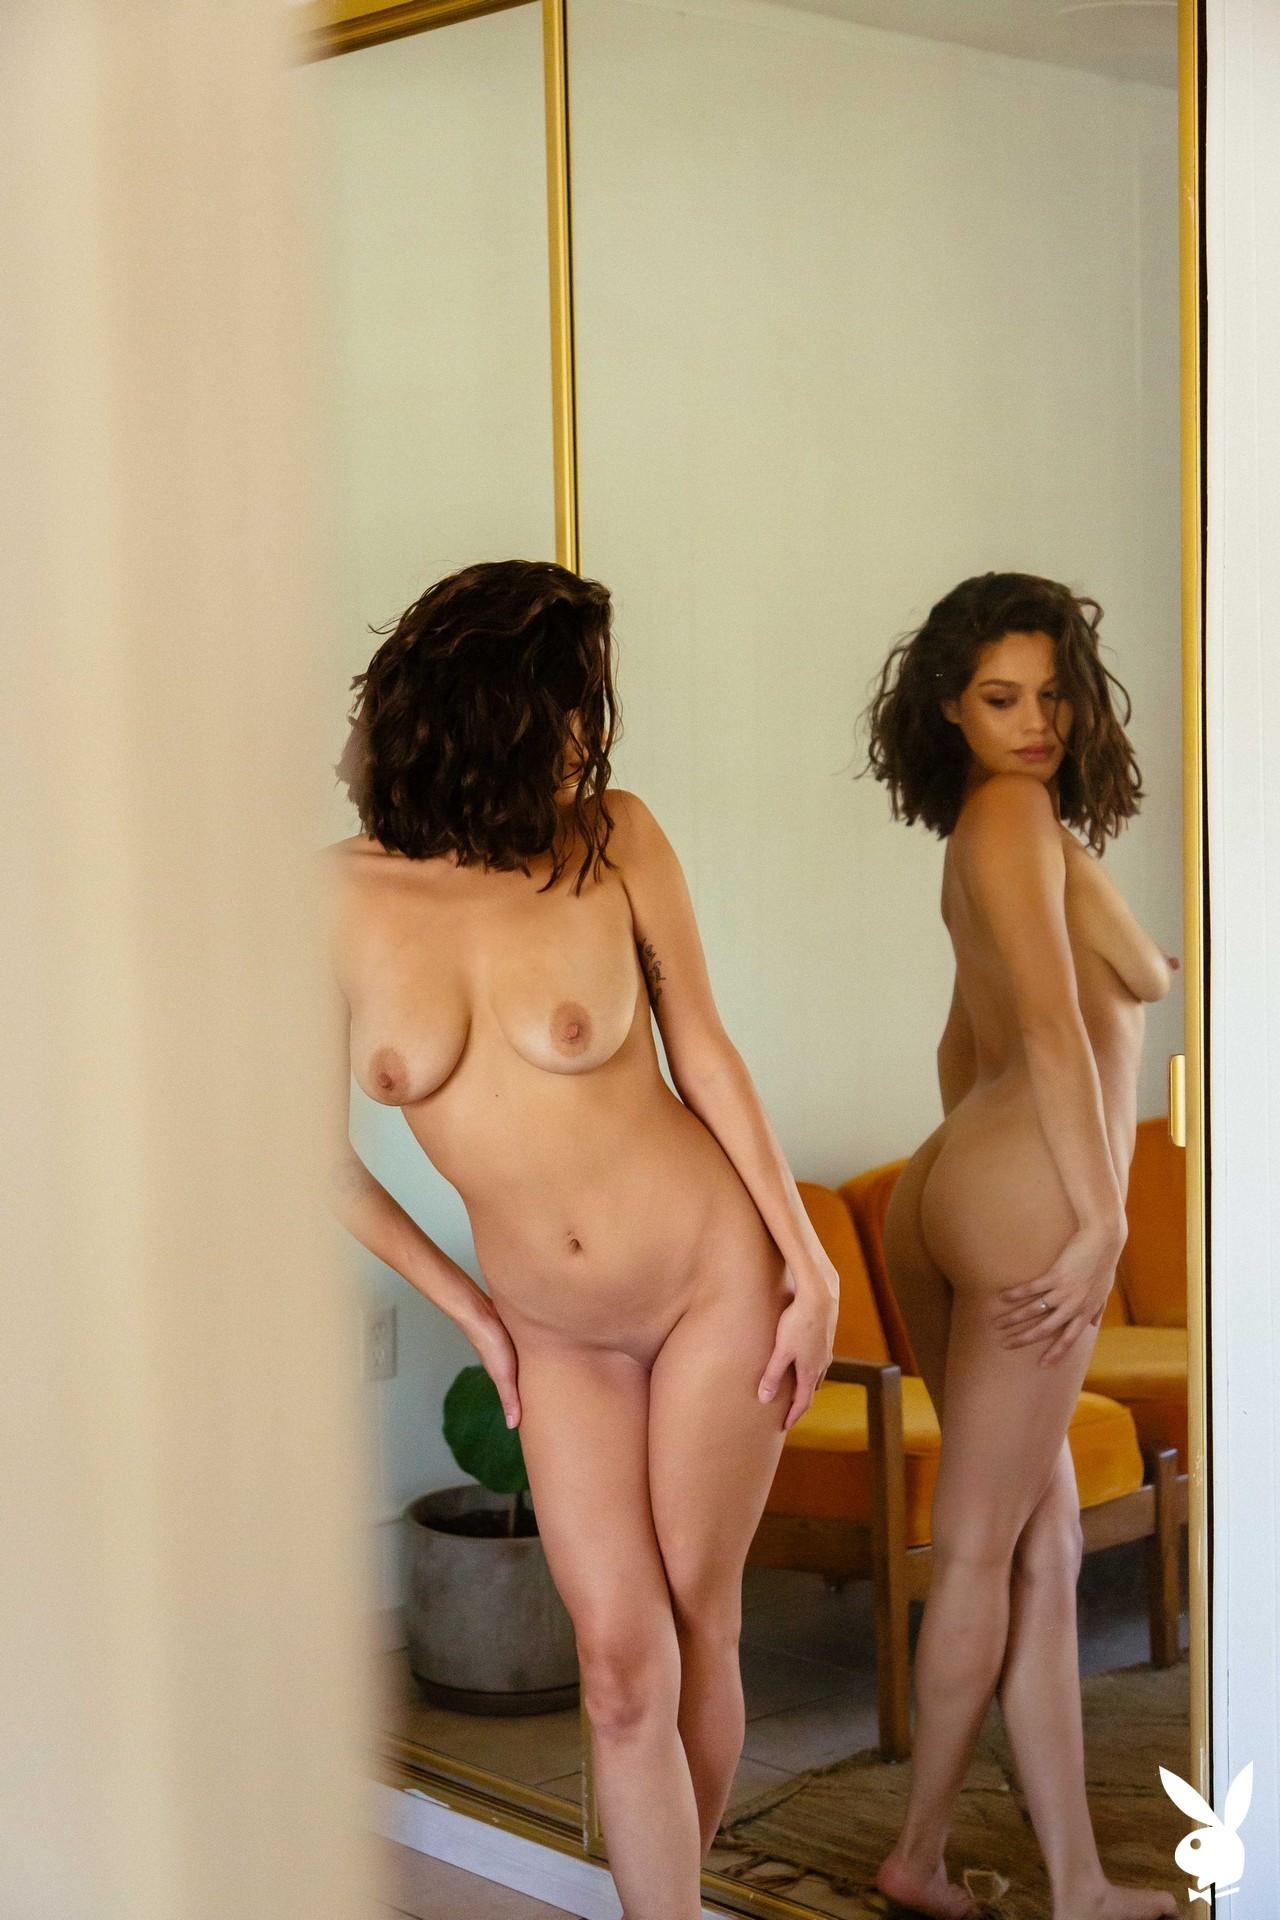 Natalie Del Real In The Simple Things Playboy Plus (34)